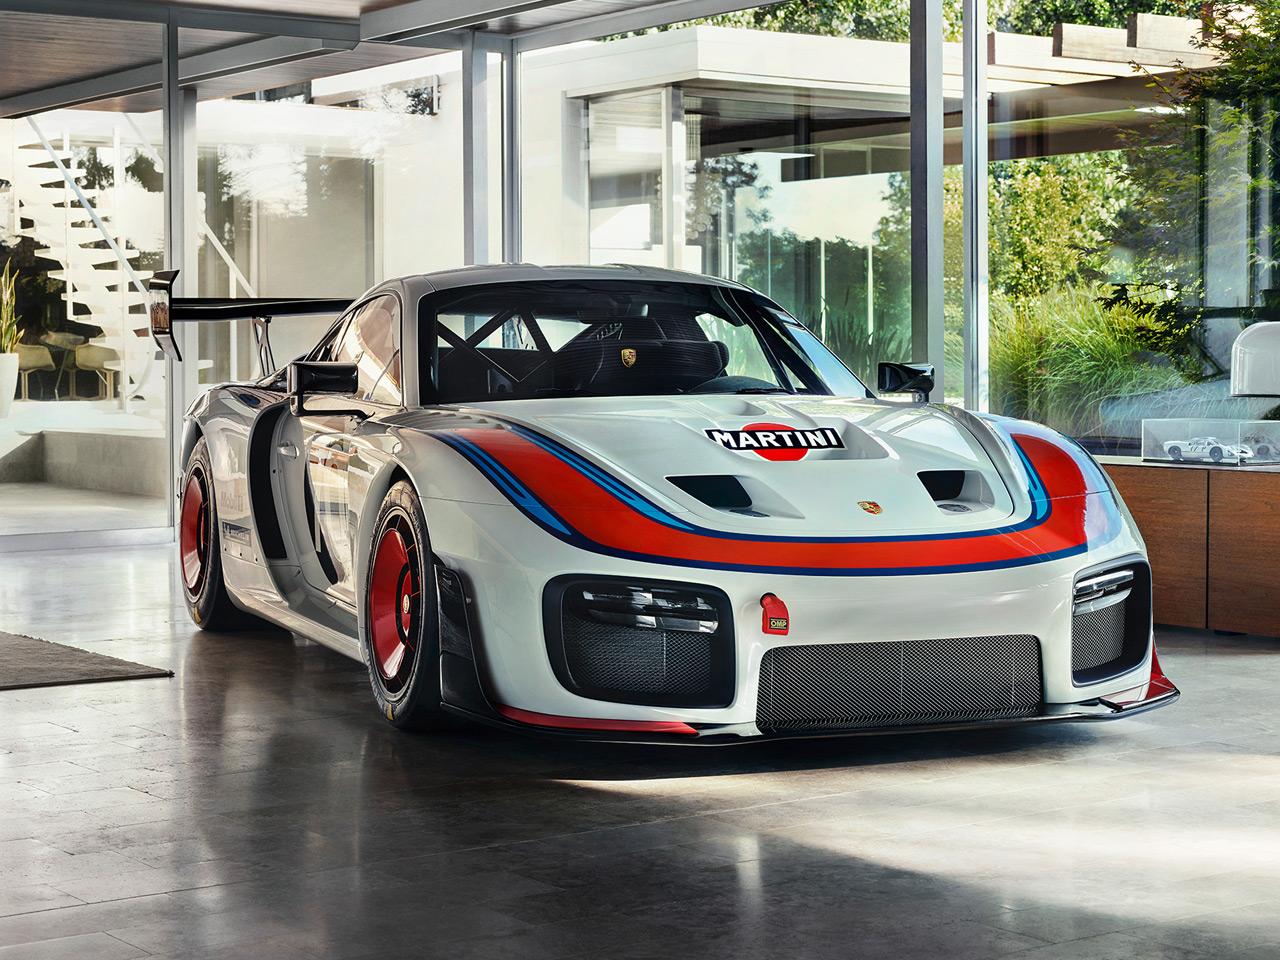 Porsche The new 935